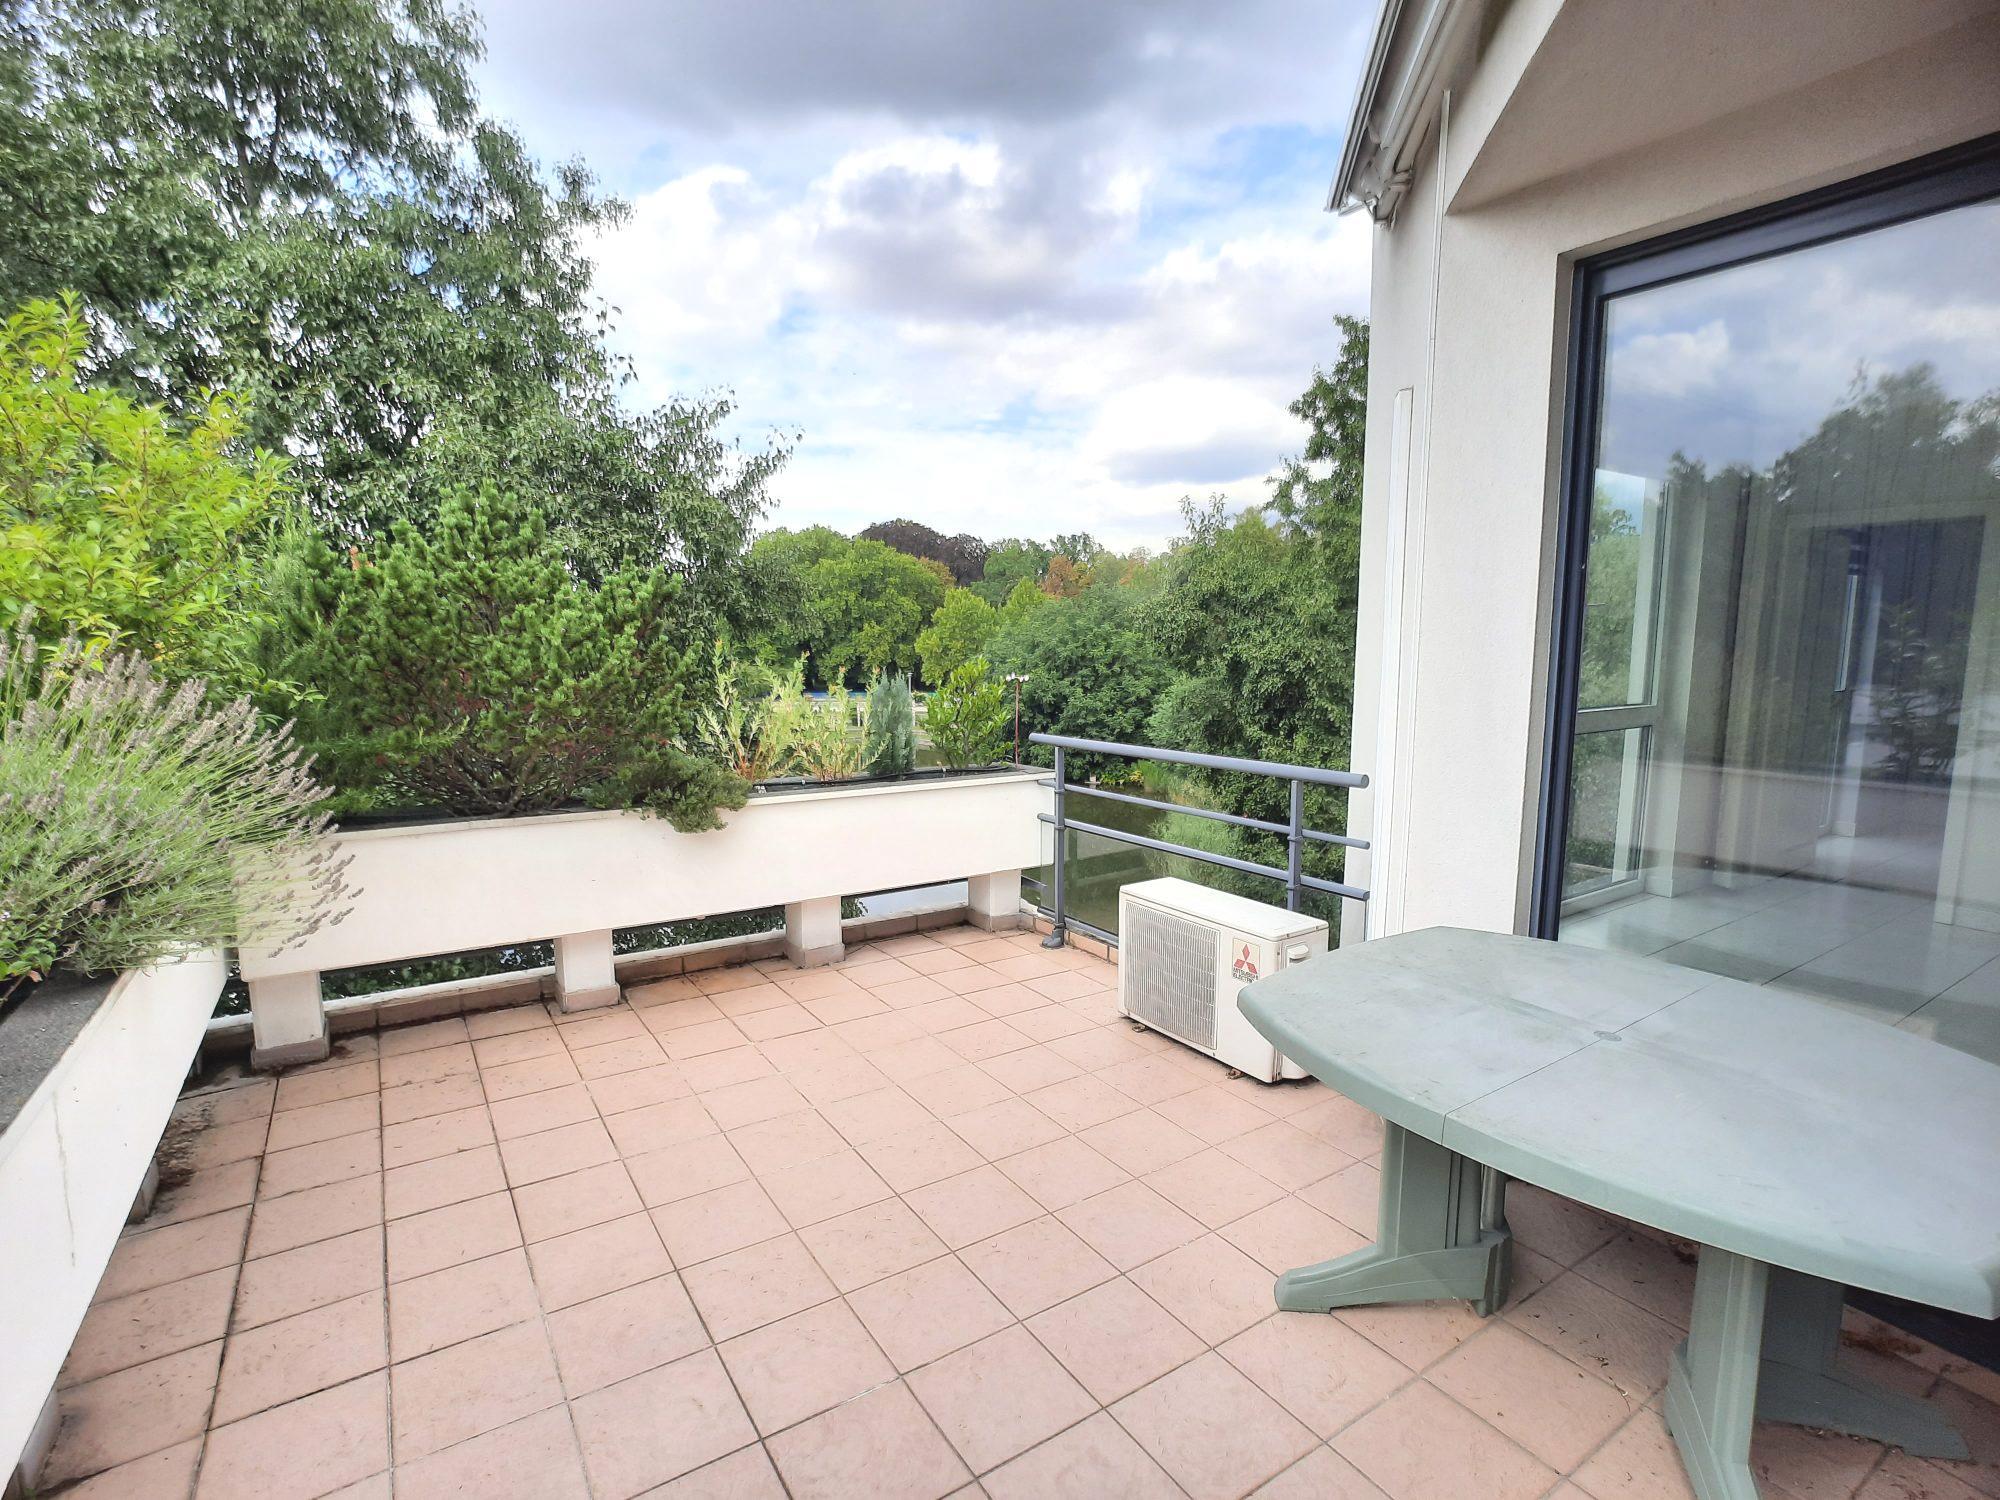 ORANGERIE - 4/5 pces de 126,30m² 2 terrasses